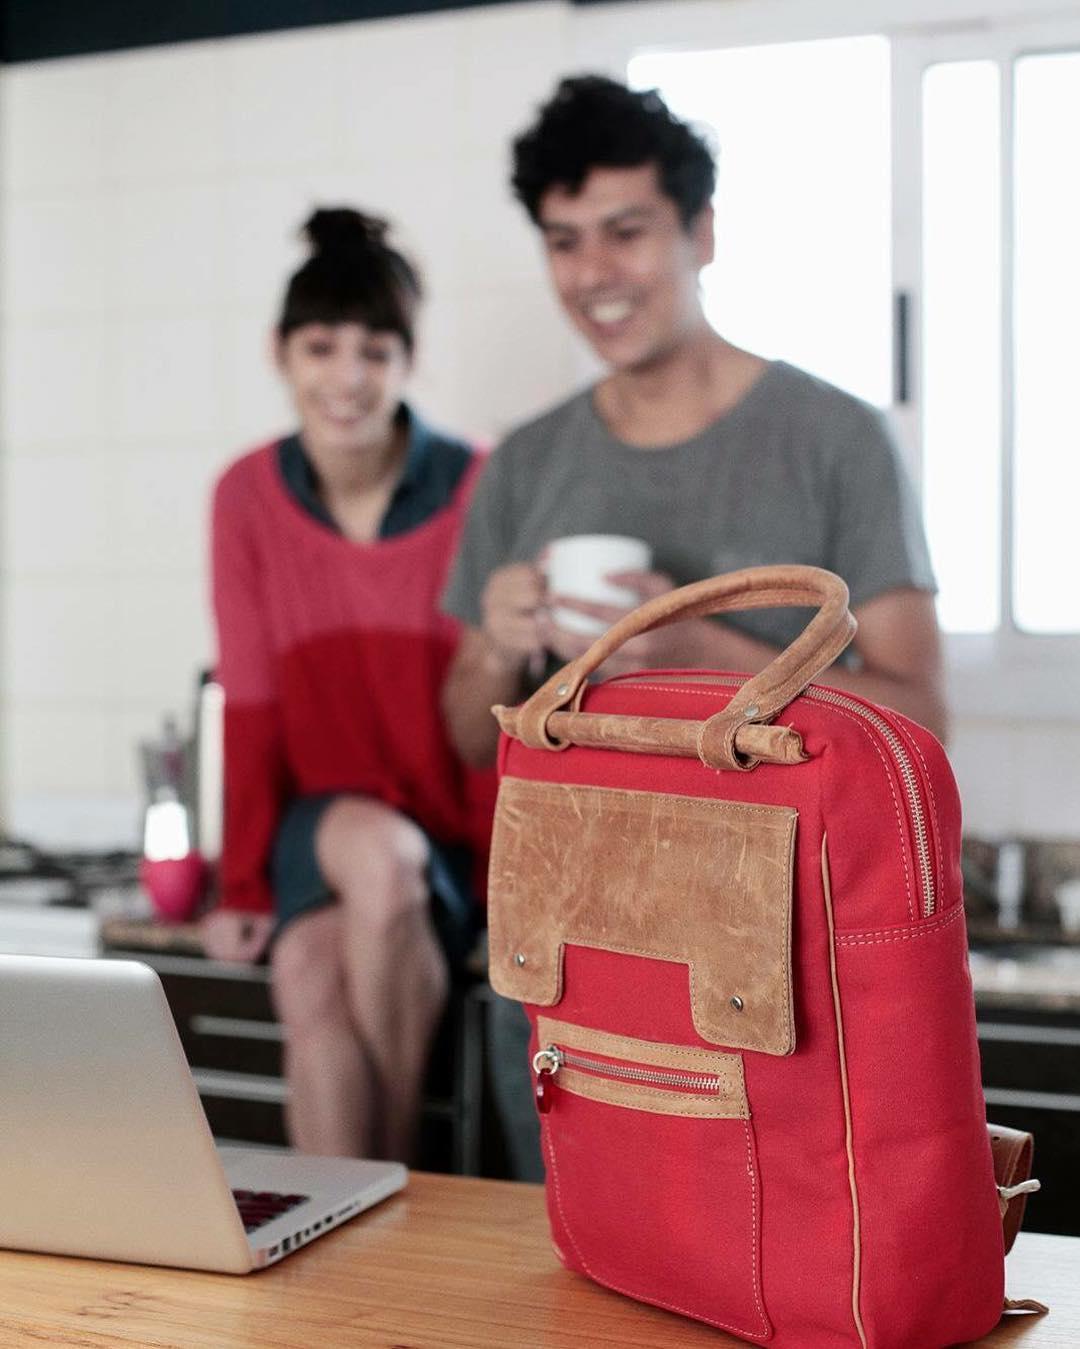 #ellos #losbunchus :) #mochila #Pitimini #diseño #design #bagpack ph @valemartinsm